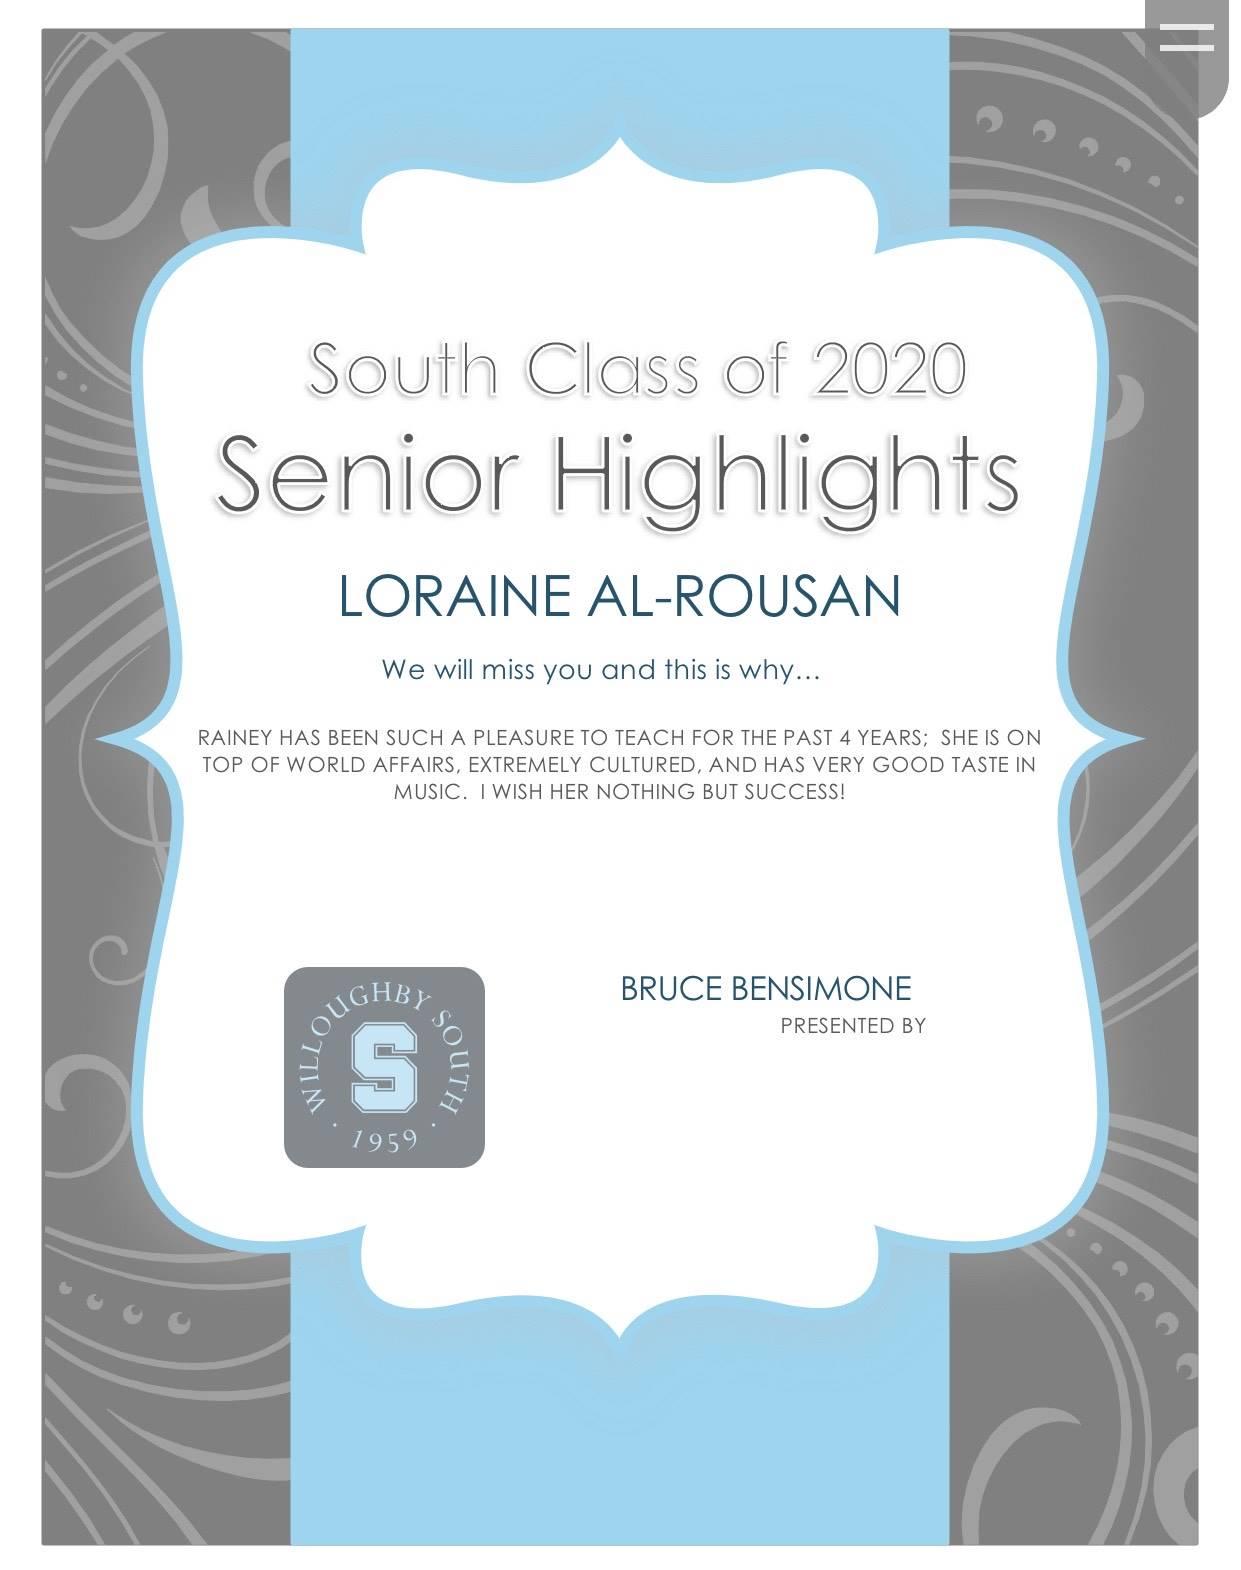 Loraine Al-Rousan